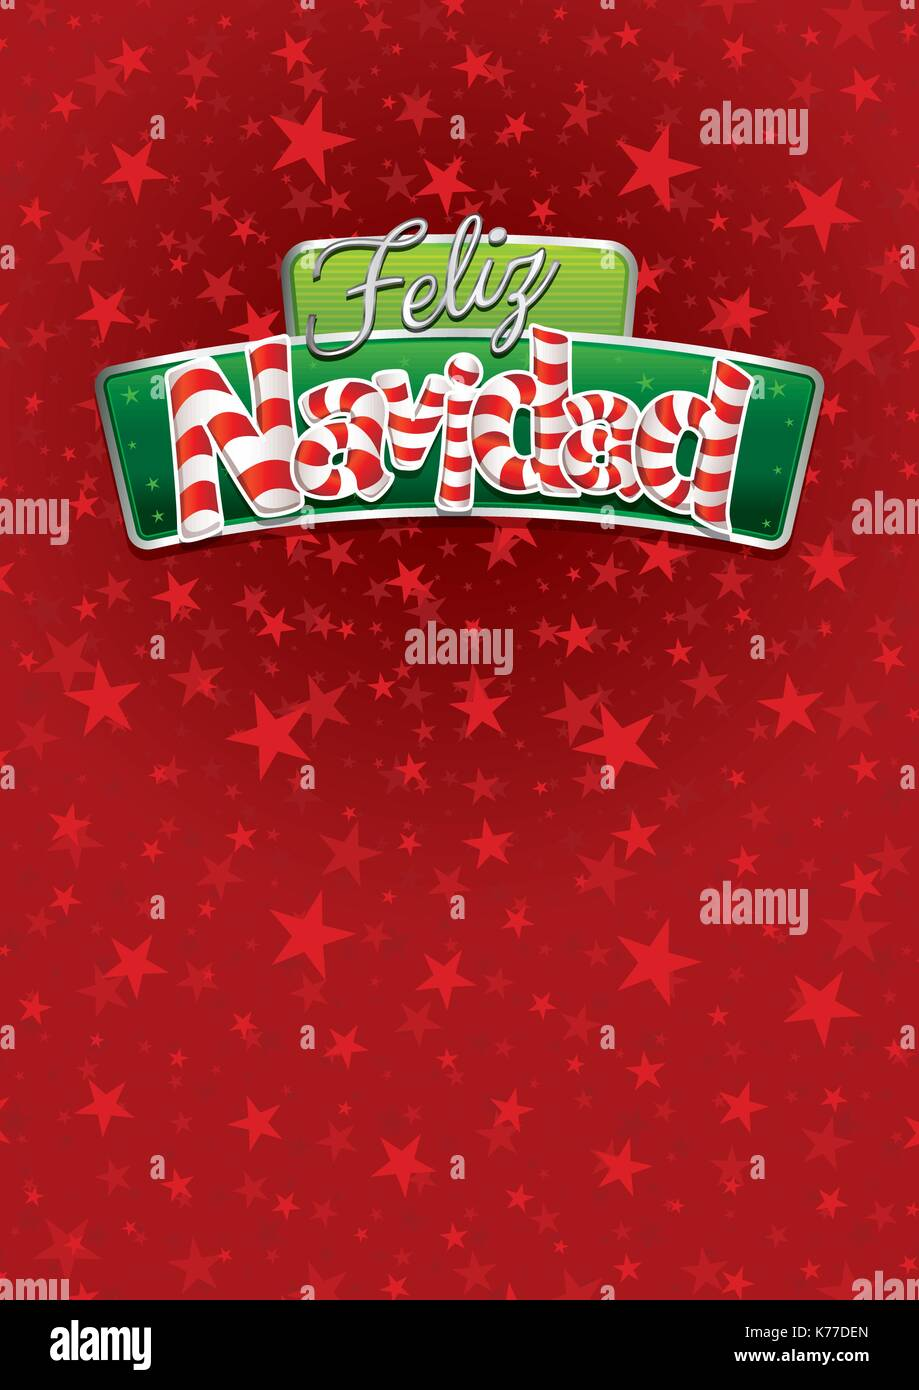 Feliz Navidad Merry Christmas In Spanish Language Red Cover Of